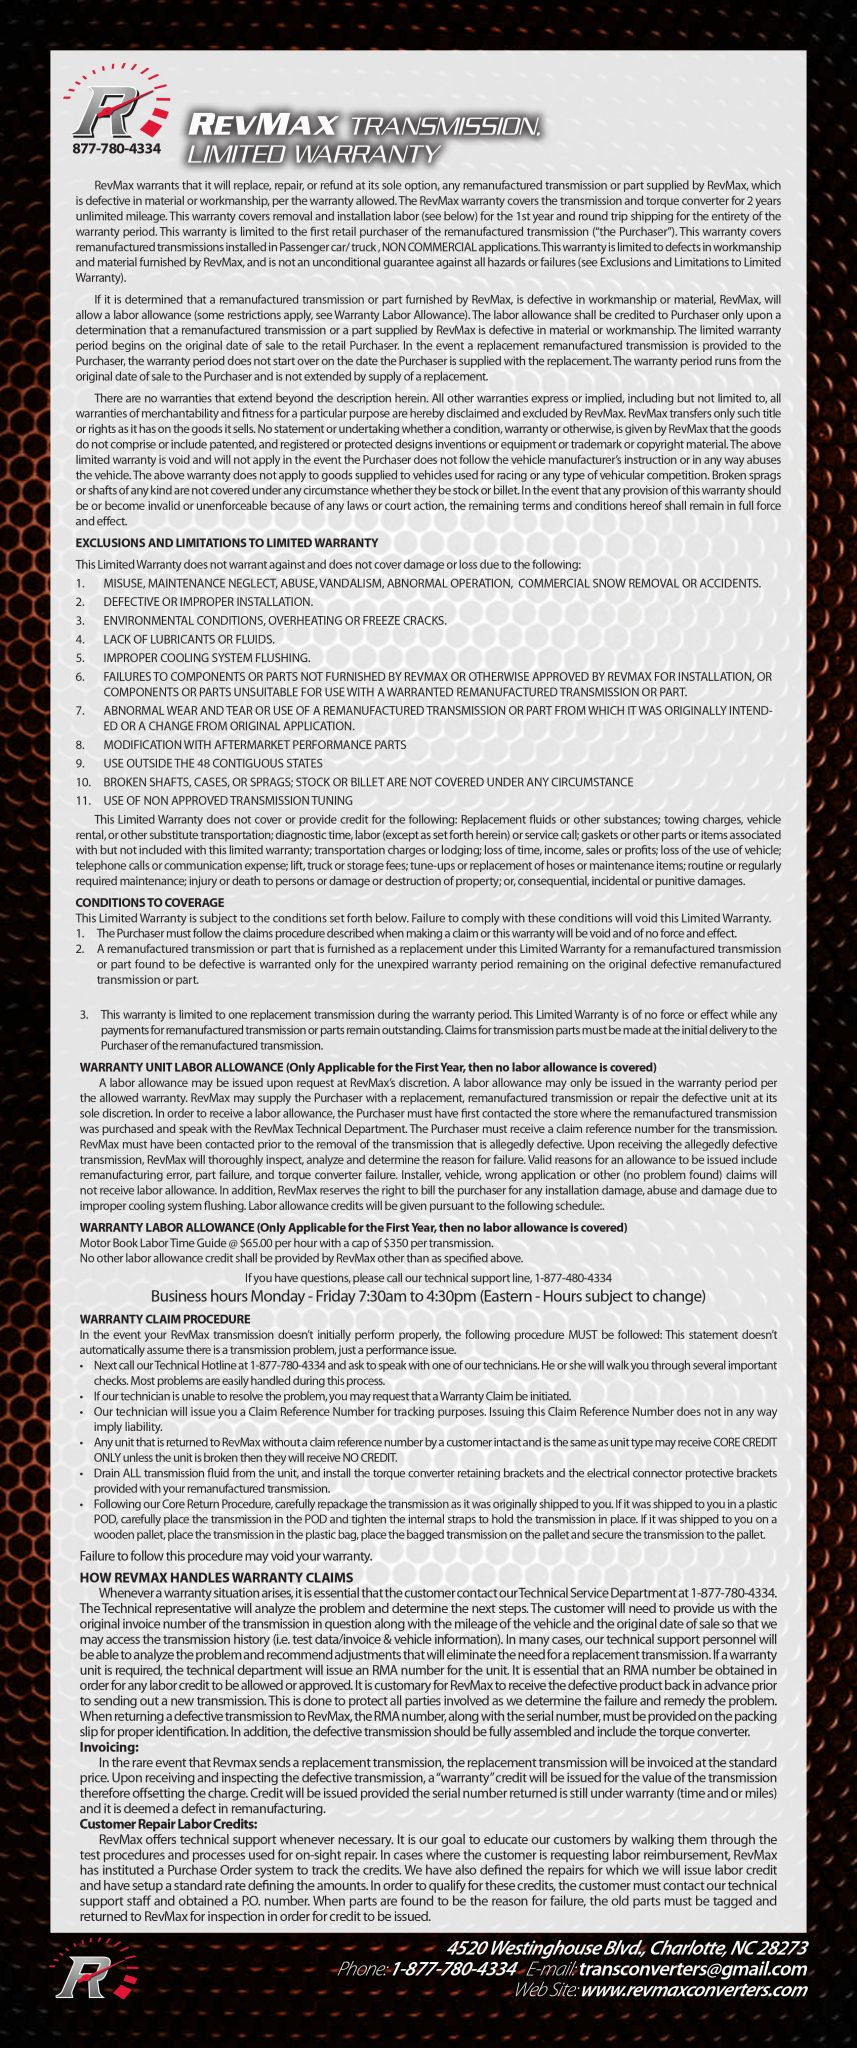 Transmissions Warranty | RevMax